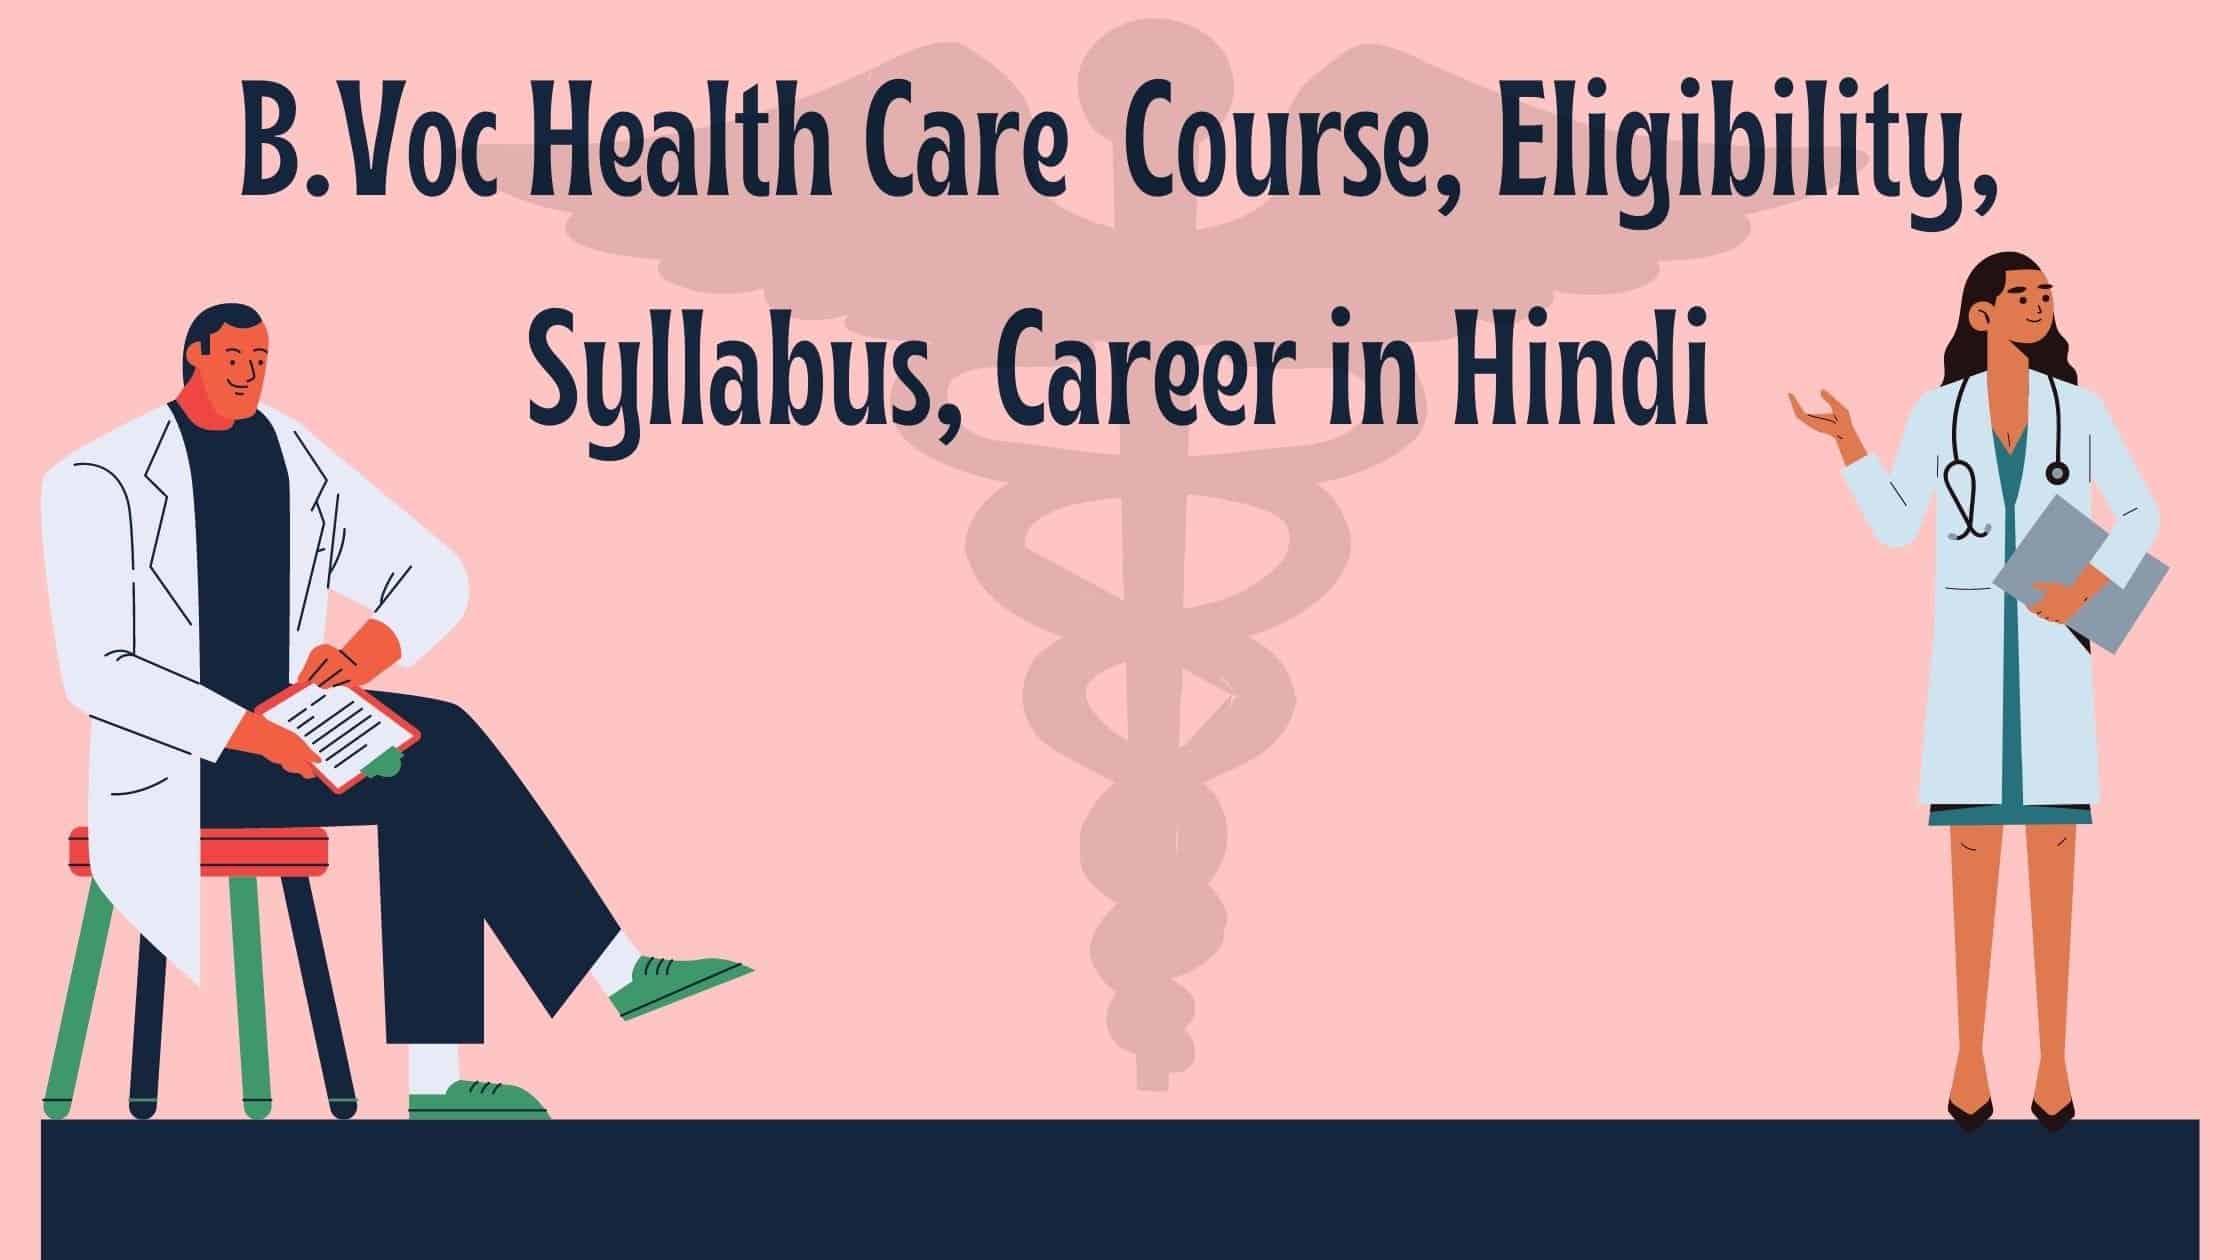 B.Voc Health Care Course, Eligibility, Syllabus, Career in Hindi